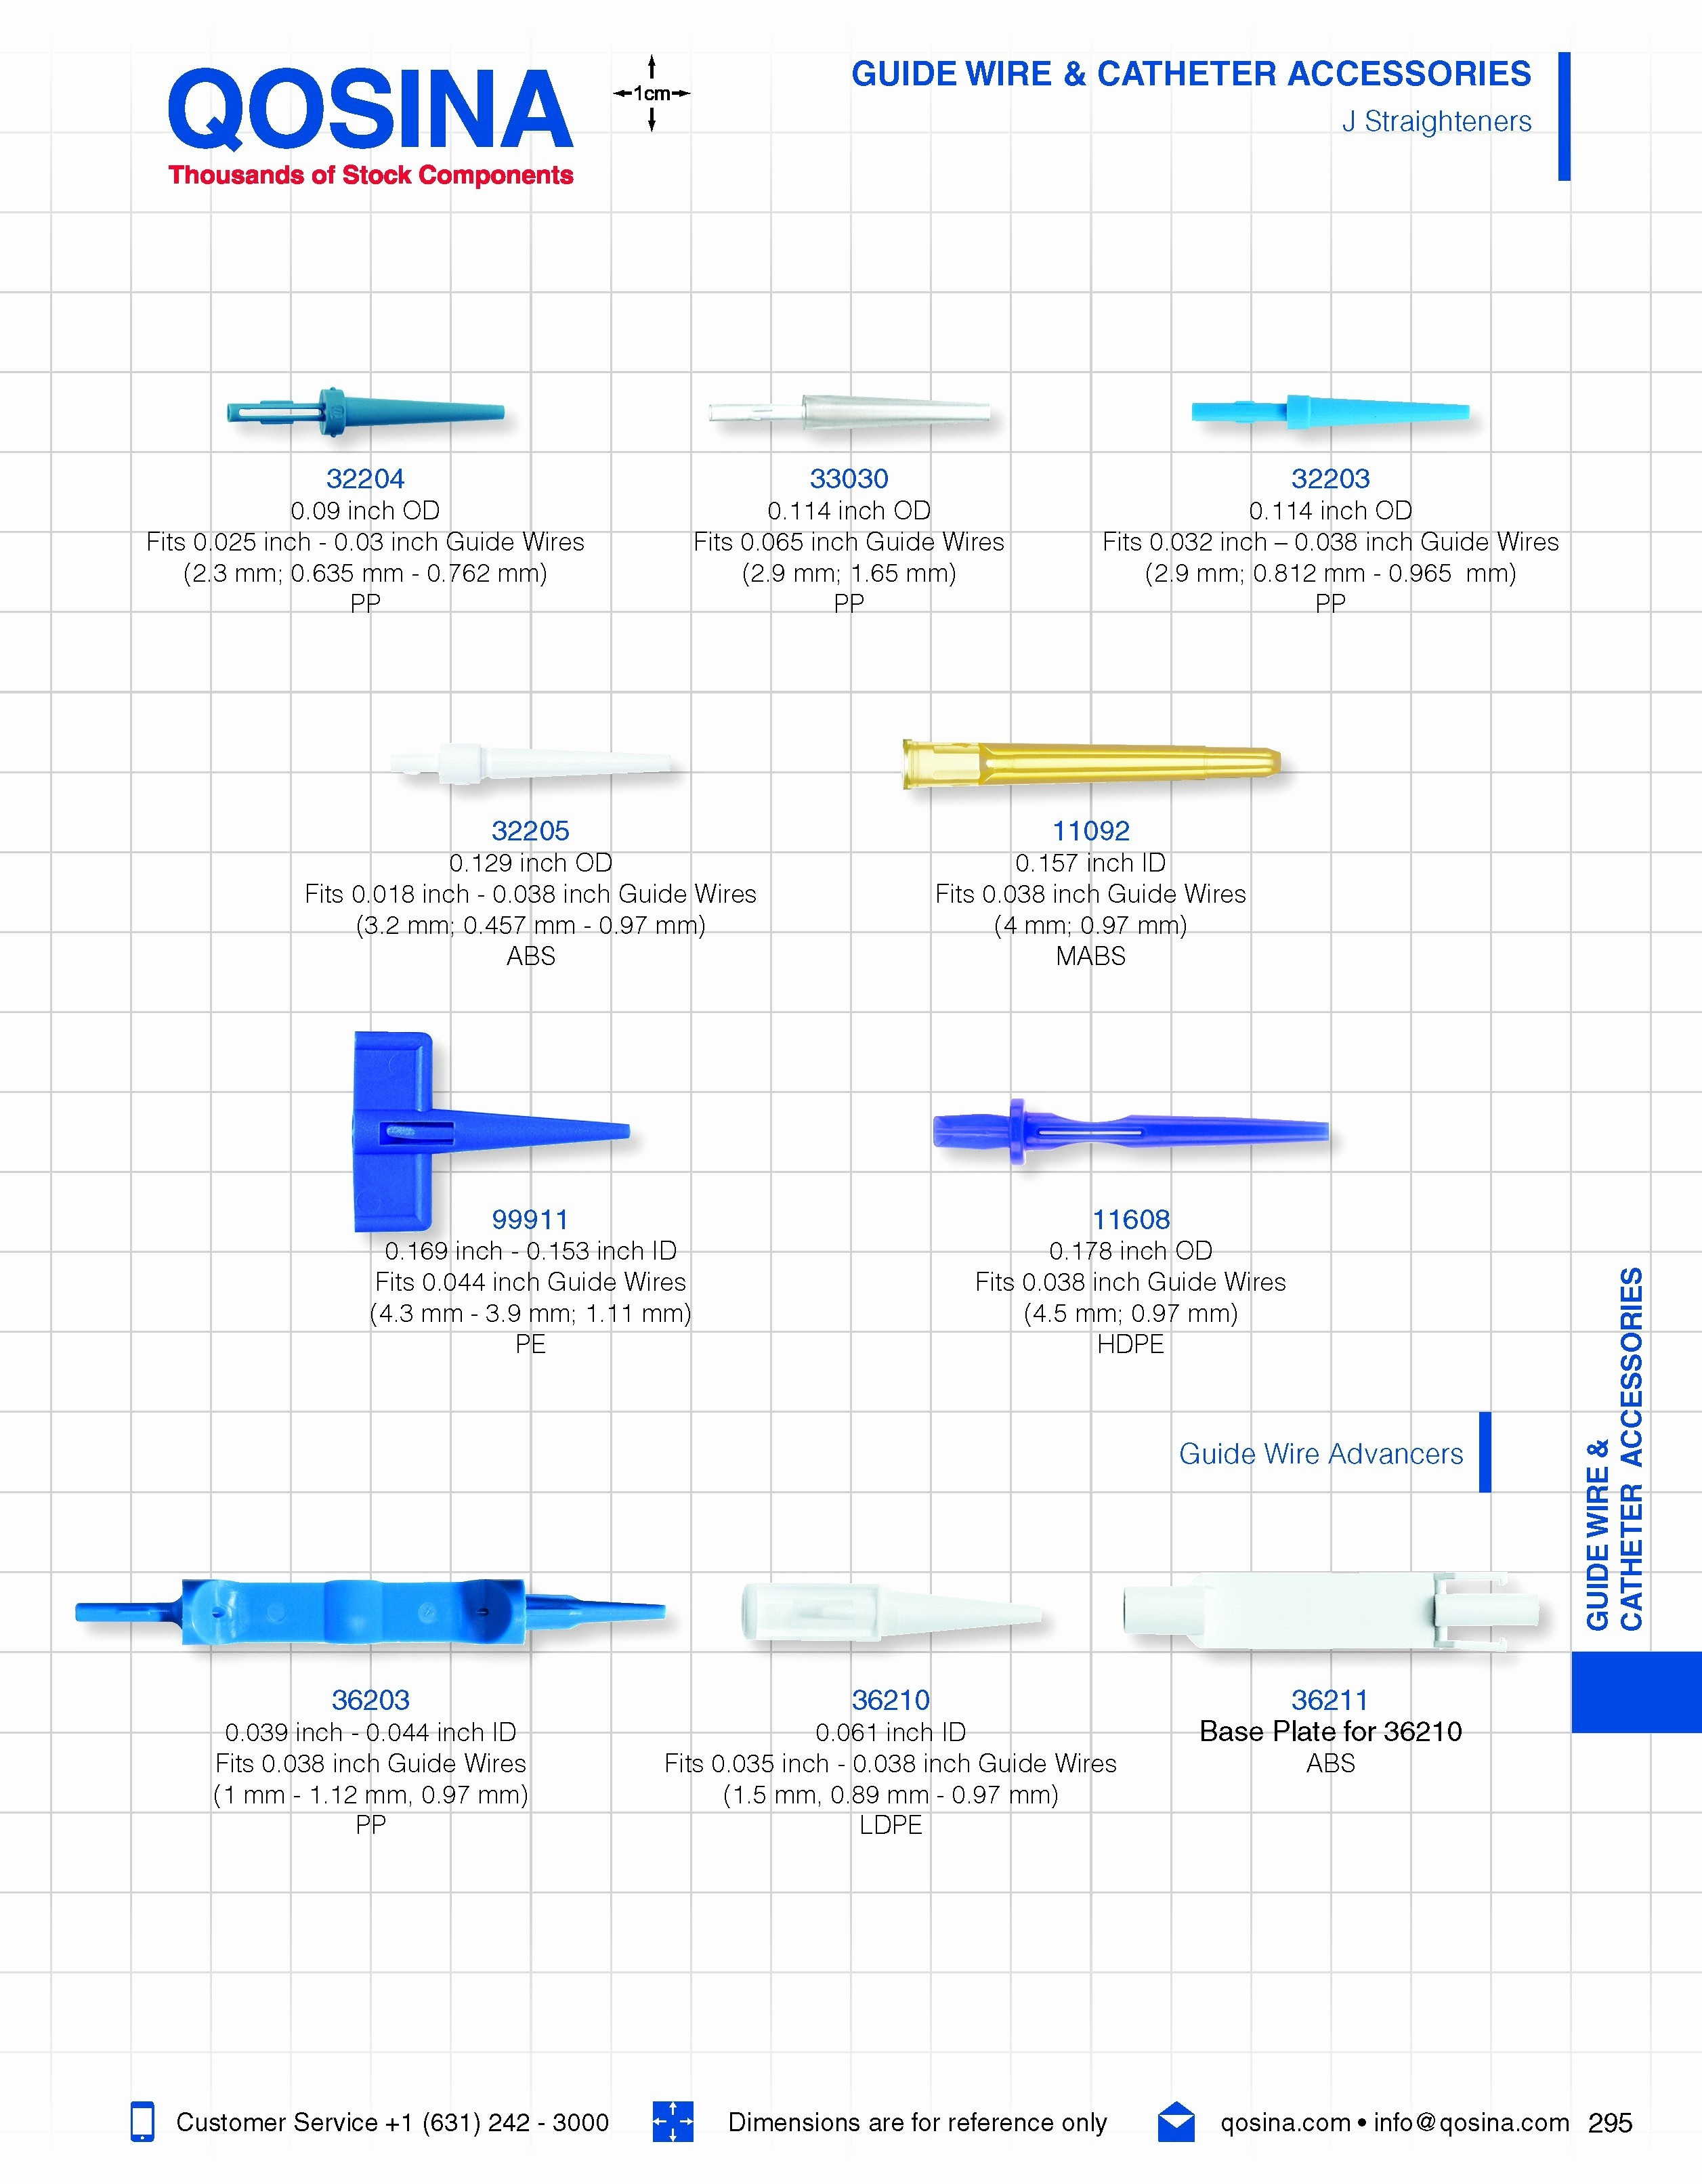 Car Audio iso Connector Diagram Clarion 16 Pin Wiring Diagram Of Car Audio iso Connector Diagram